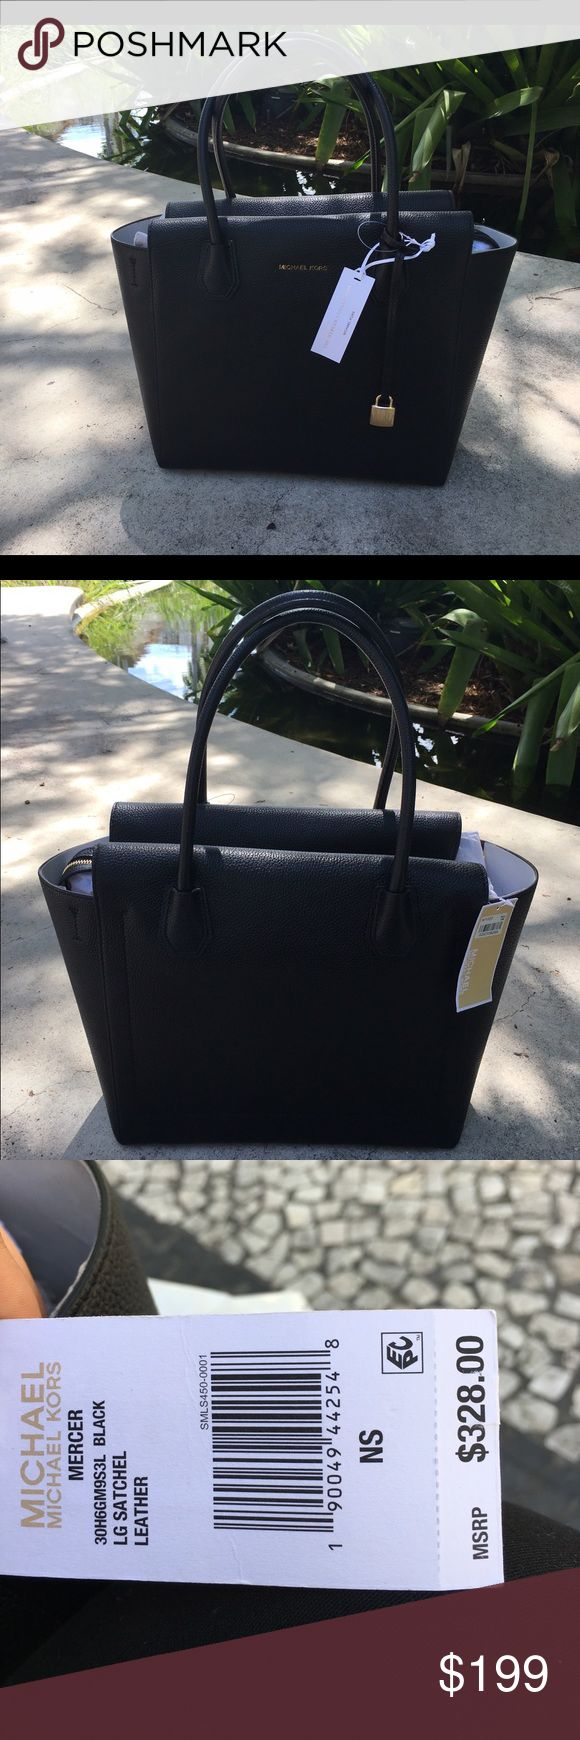 Michael Kors Handbag BLACK handbag Michael kors (LG Satchel Leather)  👜👜👜 Michael Kors Bags Satchels